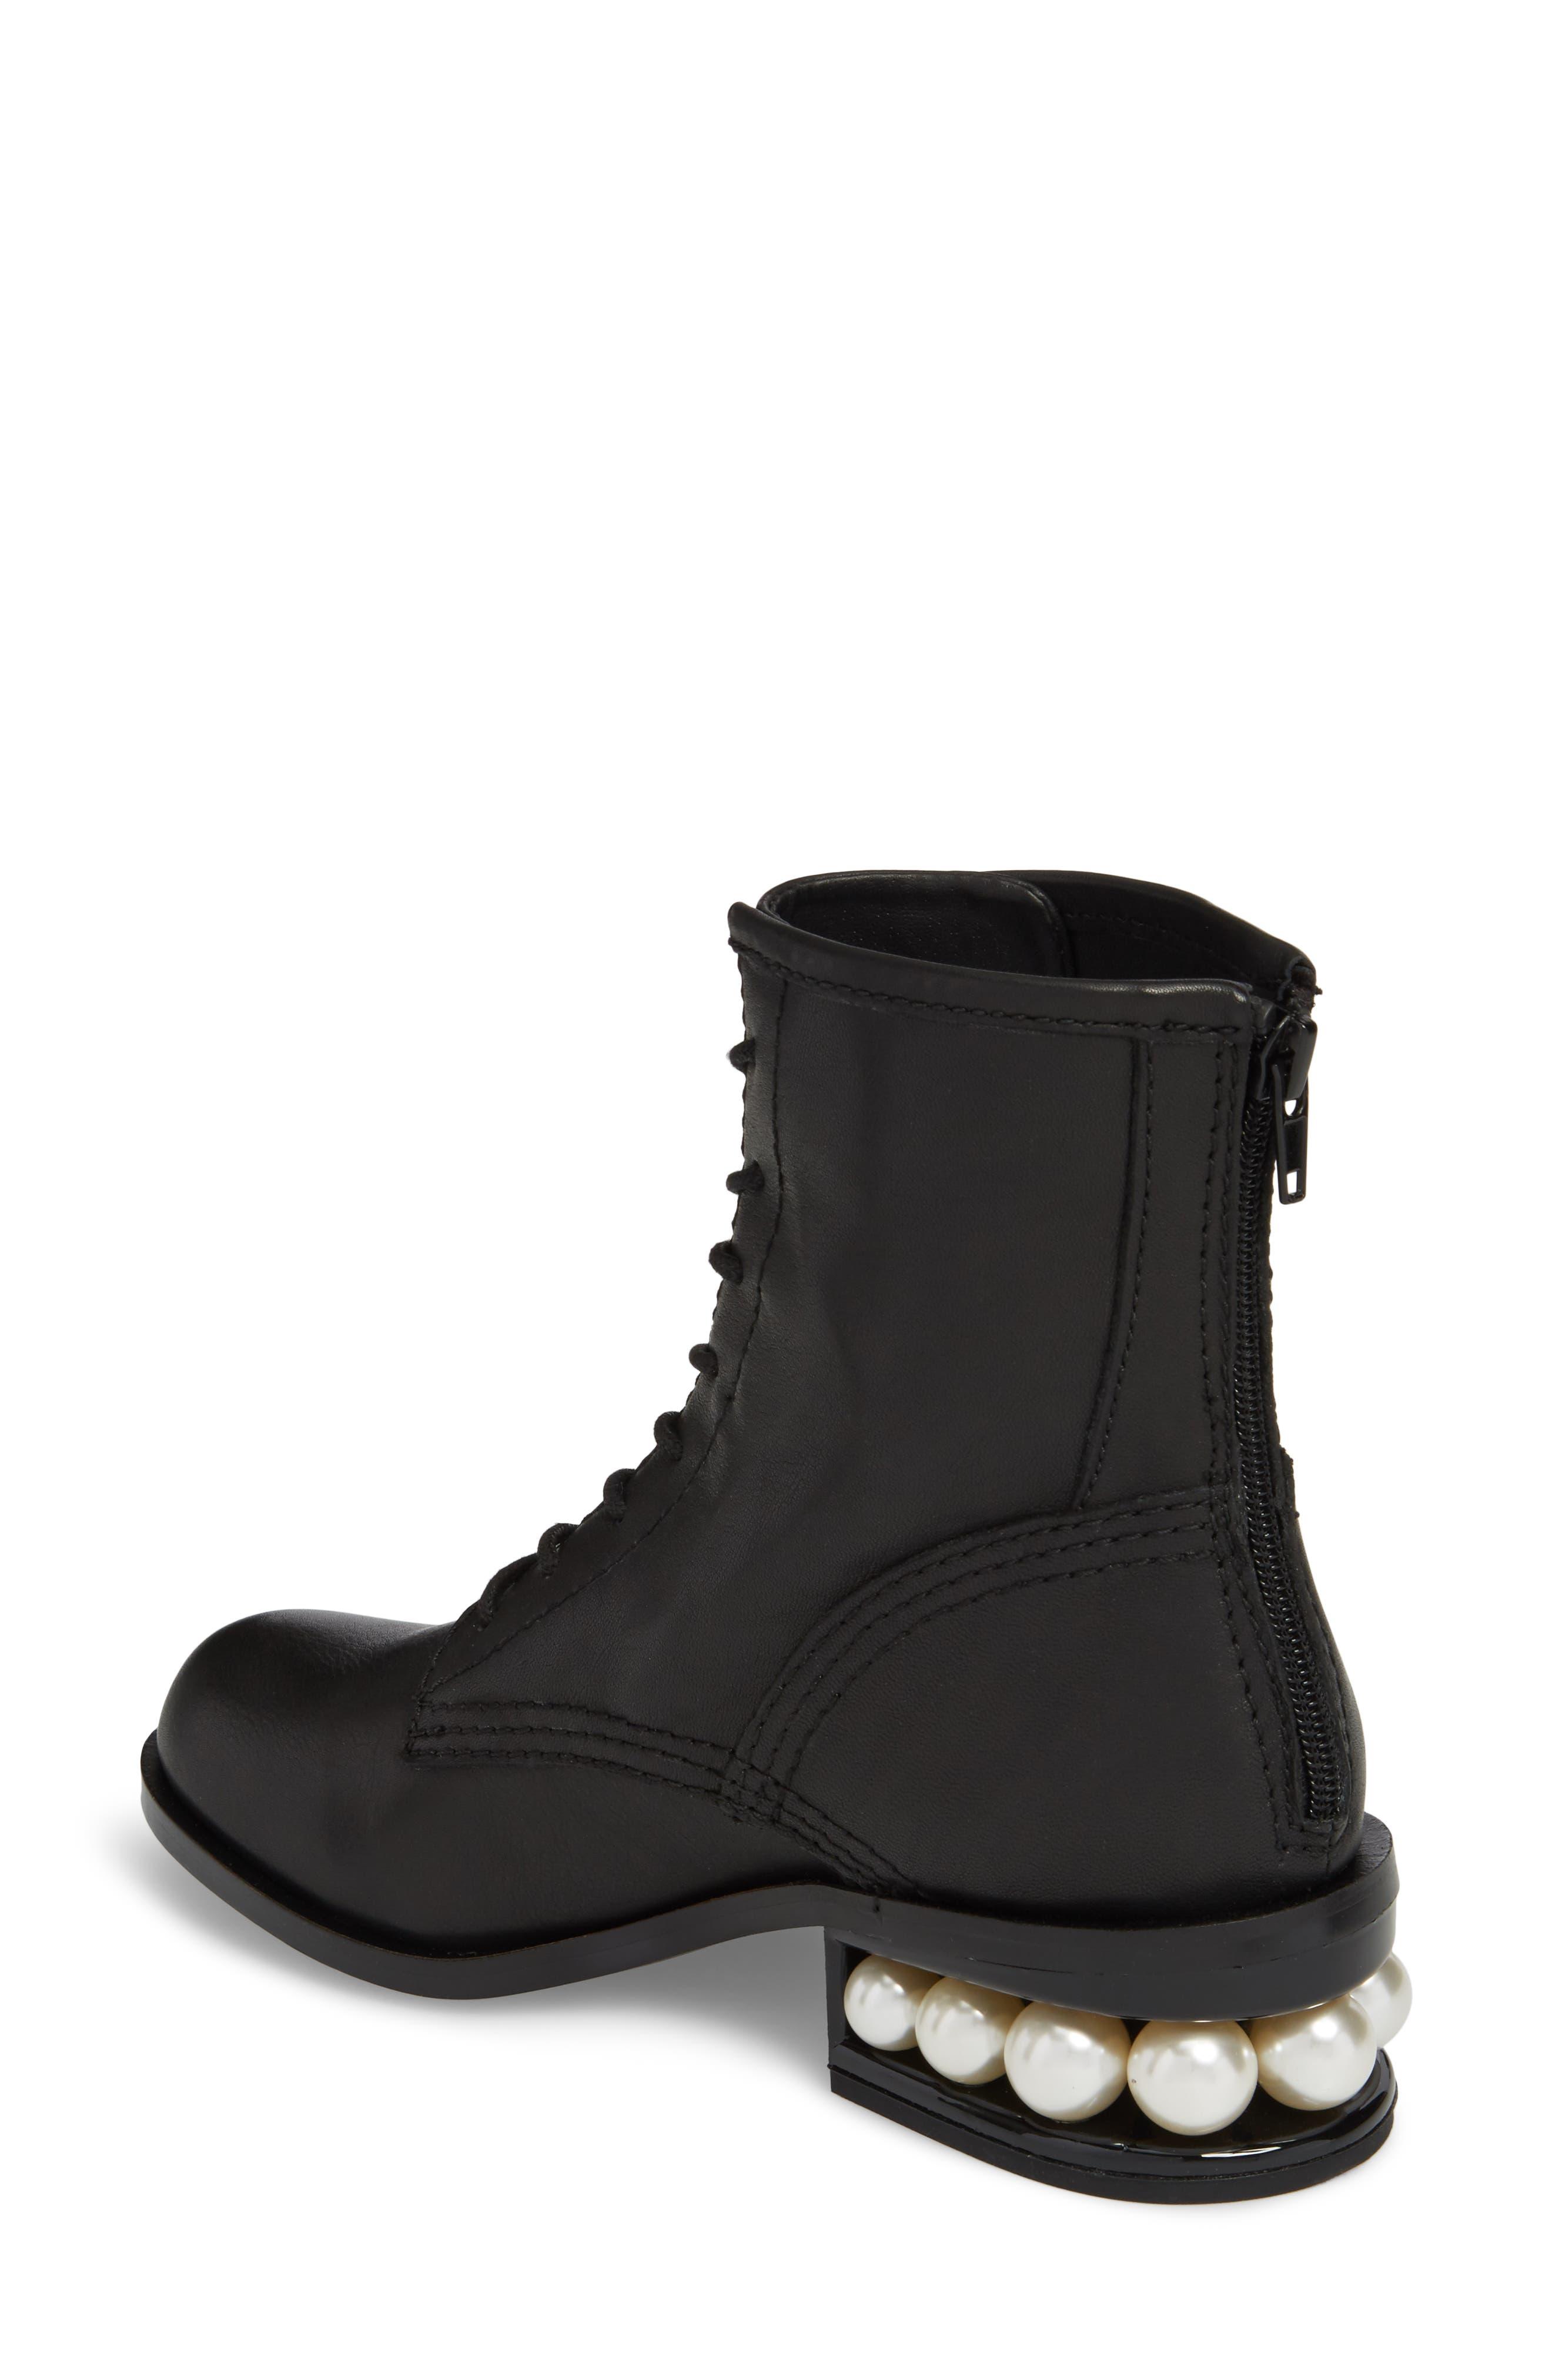 Alternate Image 2  - Steve Madden Pixy Statement Heel Boot (Women)